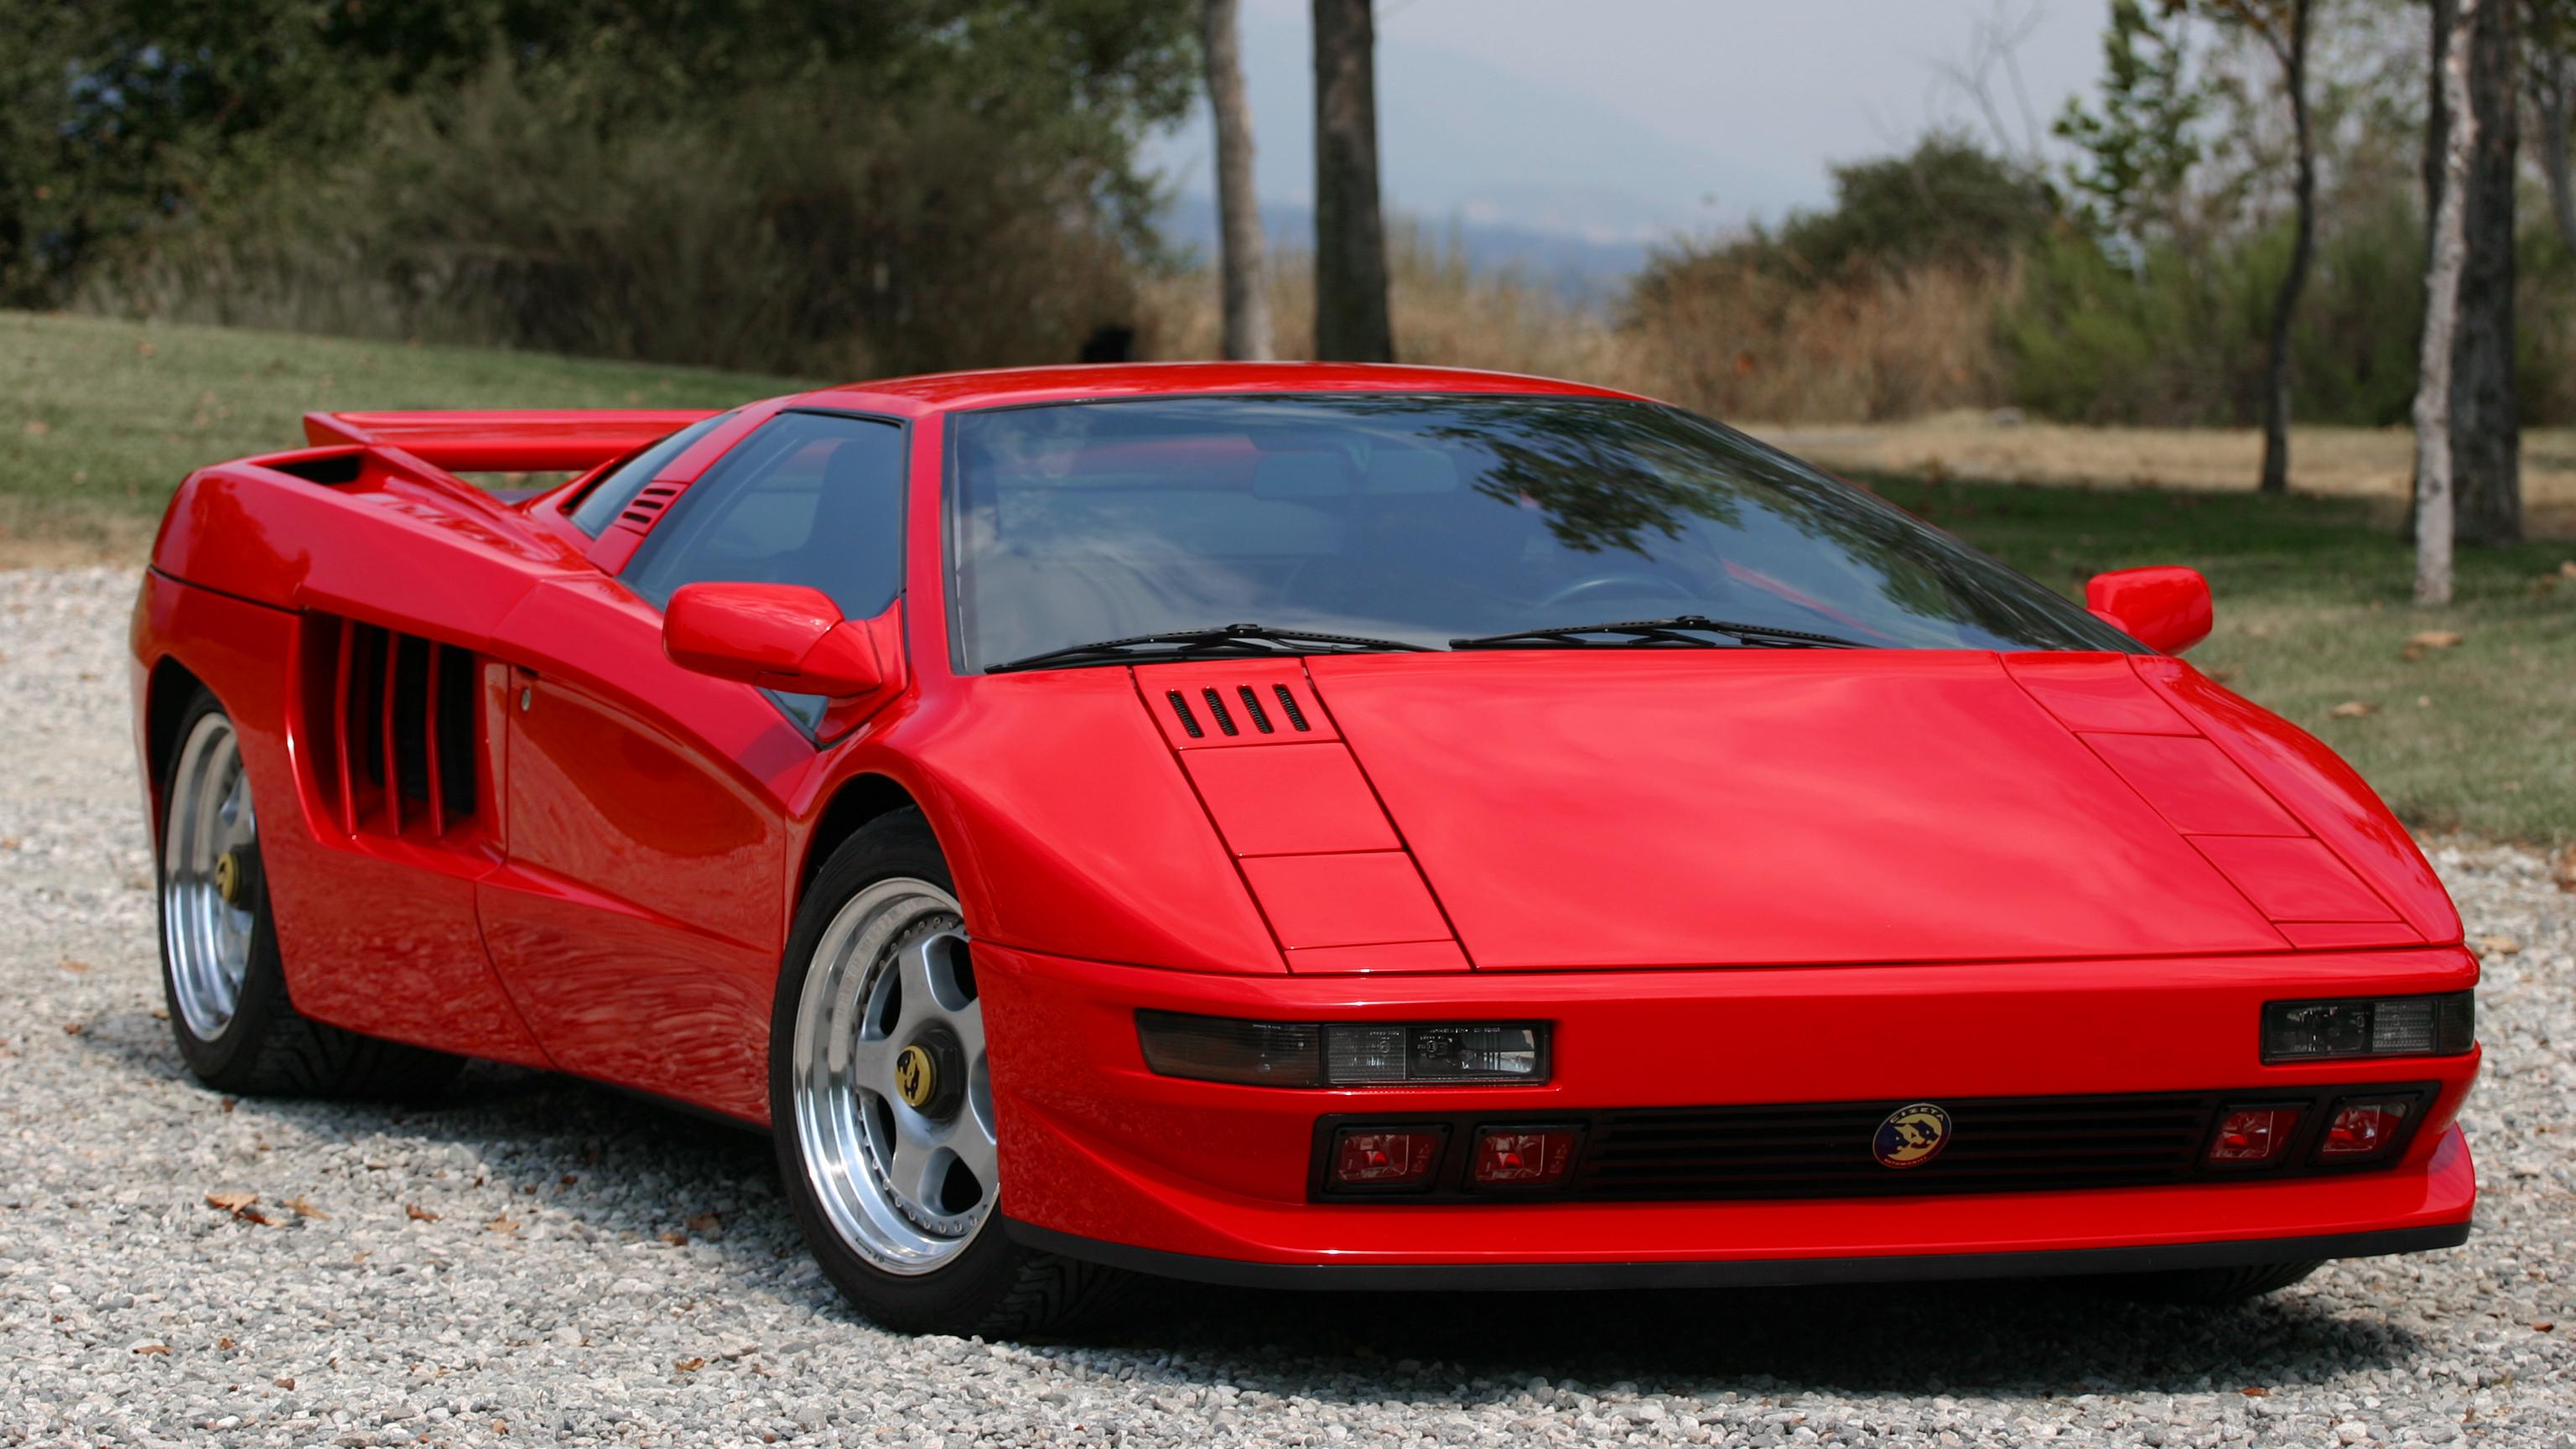 Cizeta V16t 1991 - 1995 Coupe #1